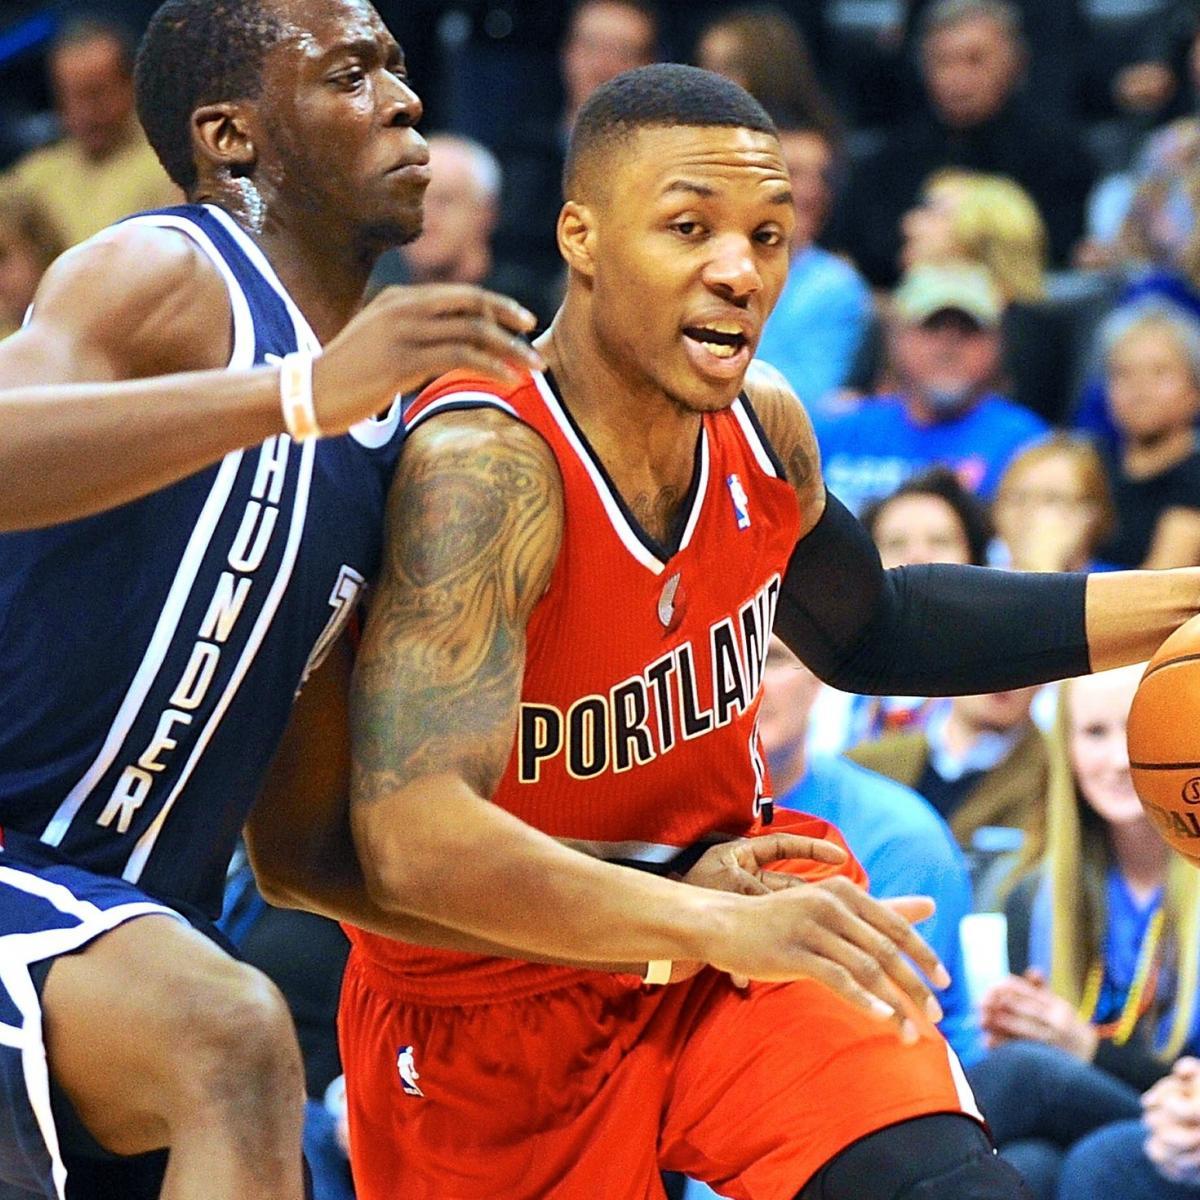 Portland Trail Blazers Final Score: Portland Trail Blazers Vs. Oklahoma City Thunder: Live